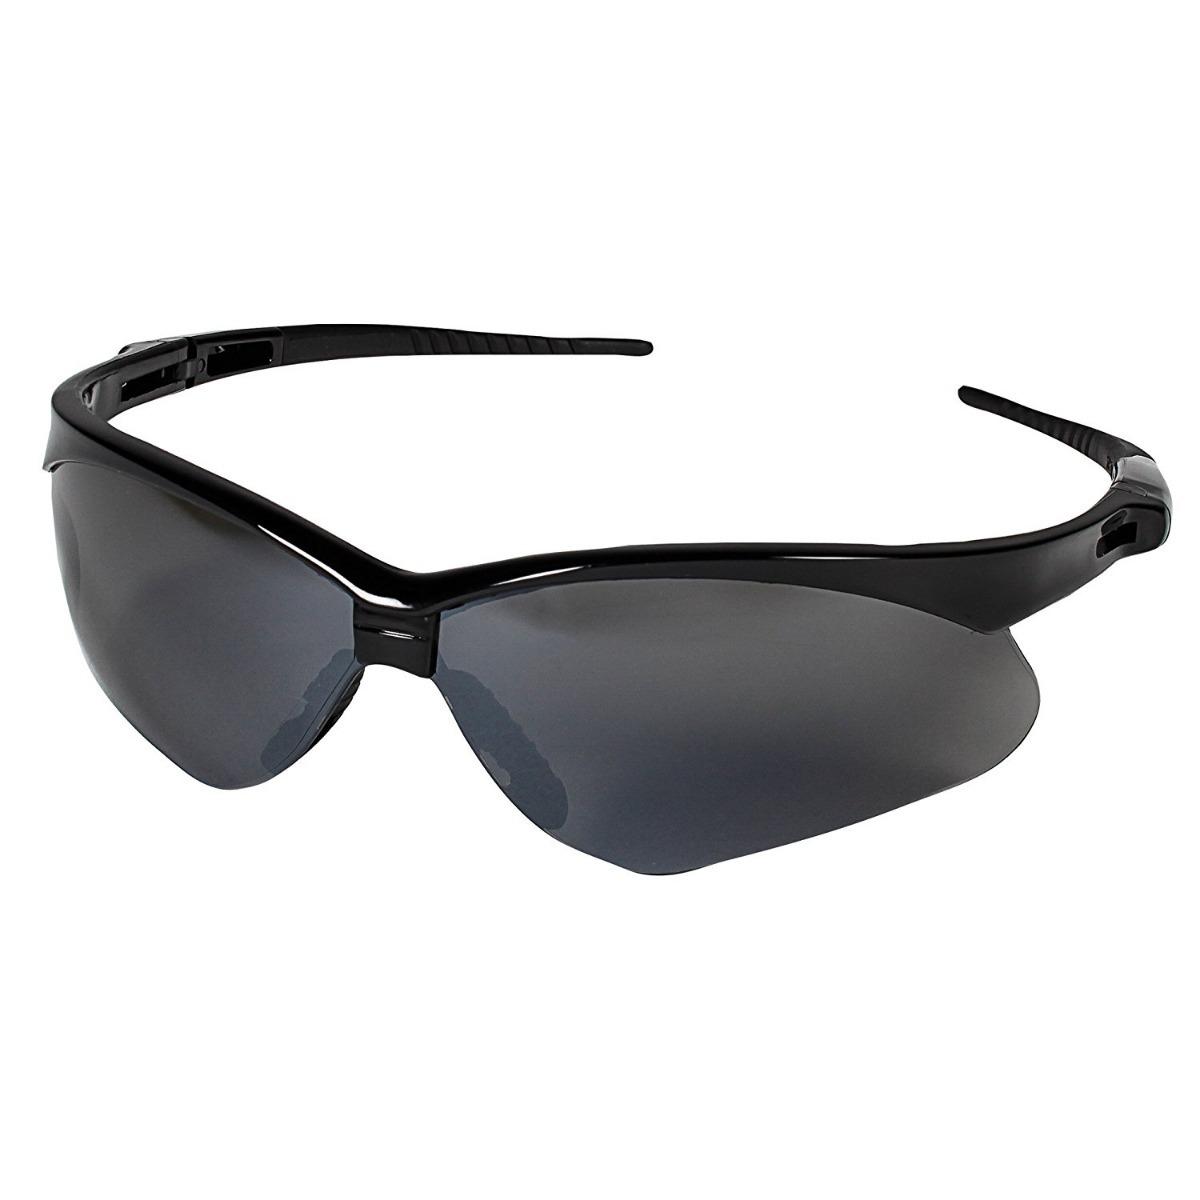 oculos nemesis jackson armacao preta lente fume epi uv ca un. Carregando  zoom. 950cfdf989